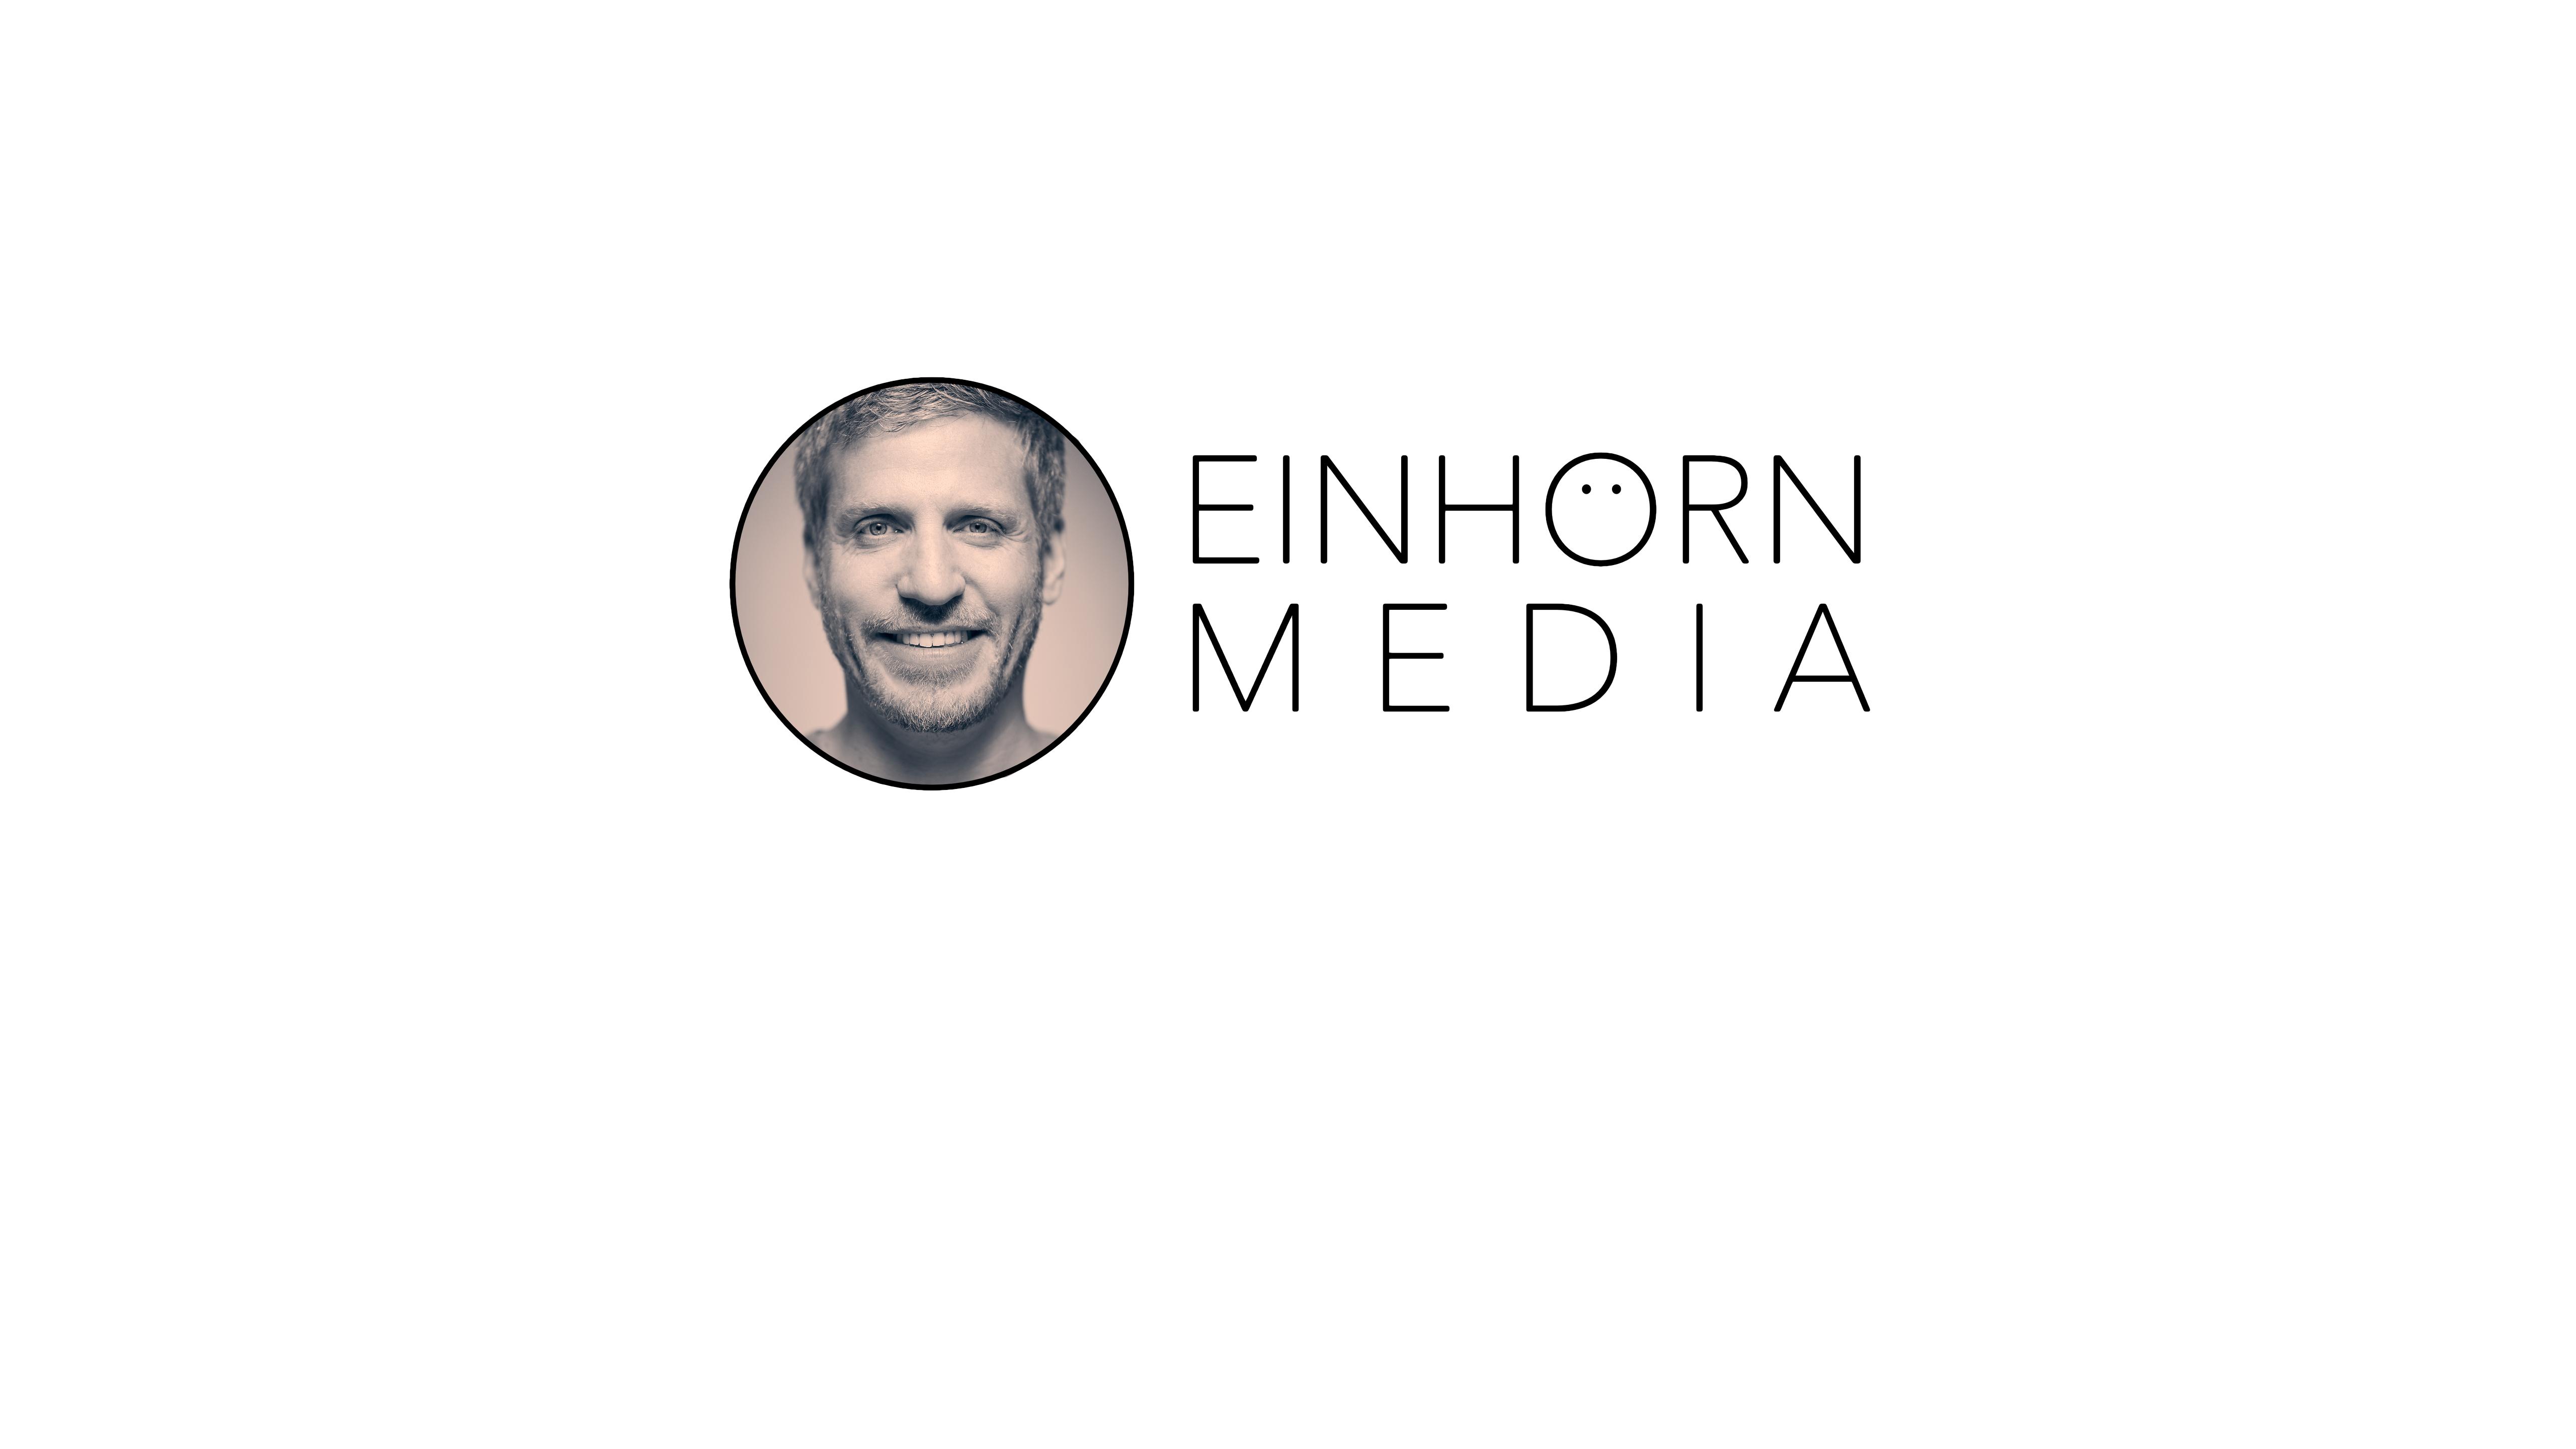 EINHÖRN MEDIA mit Foto